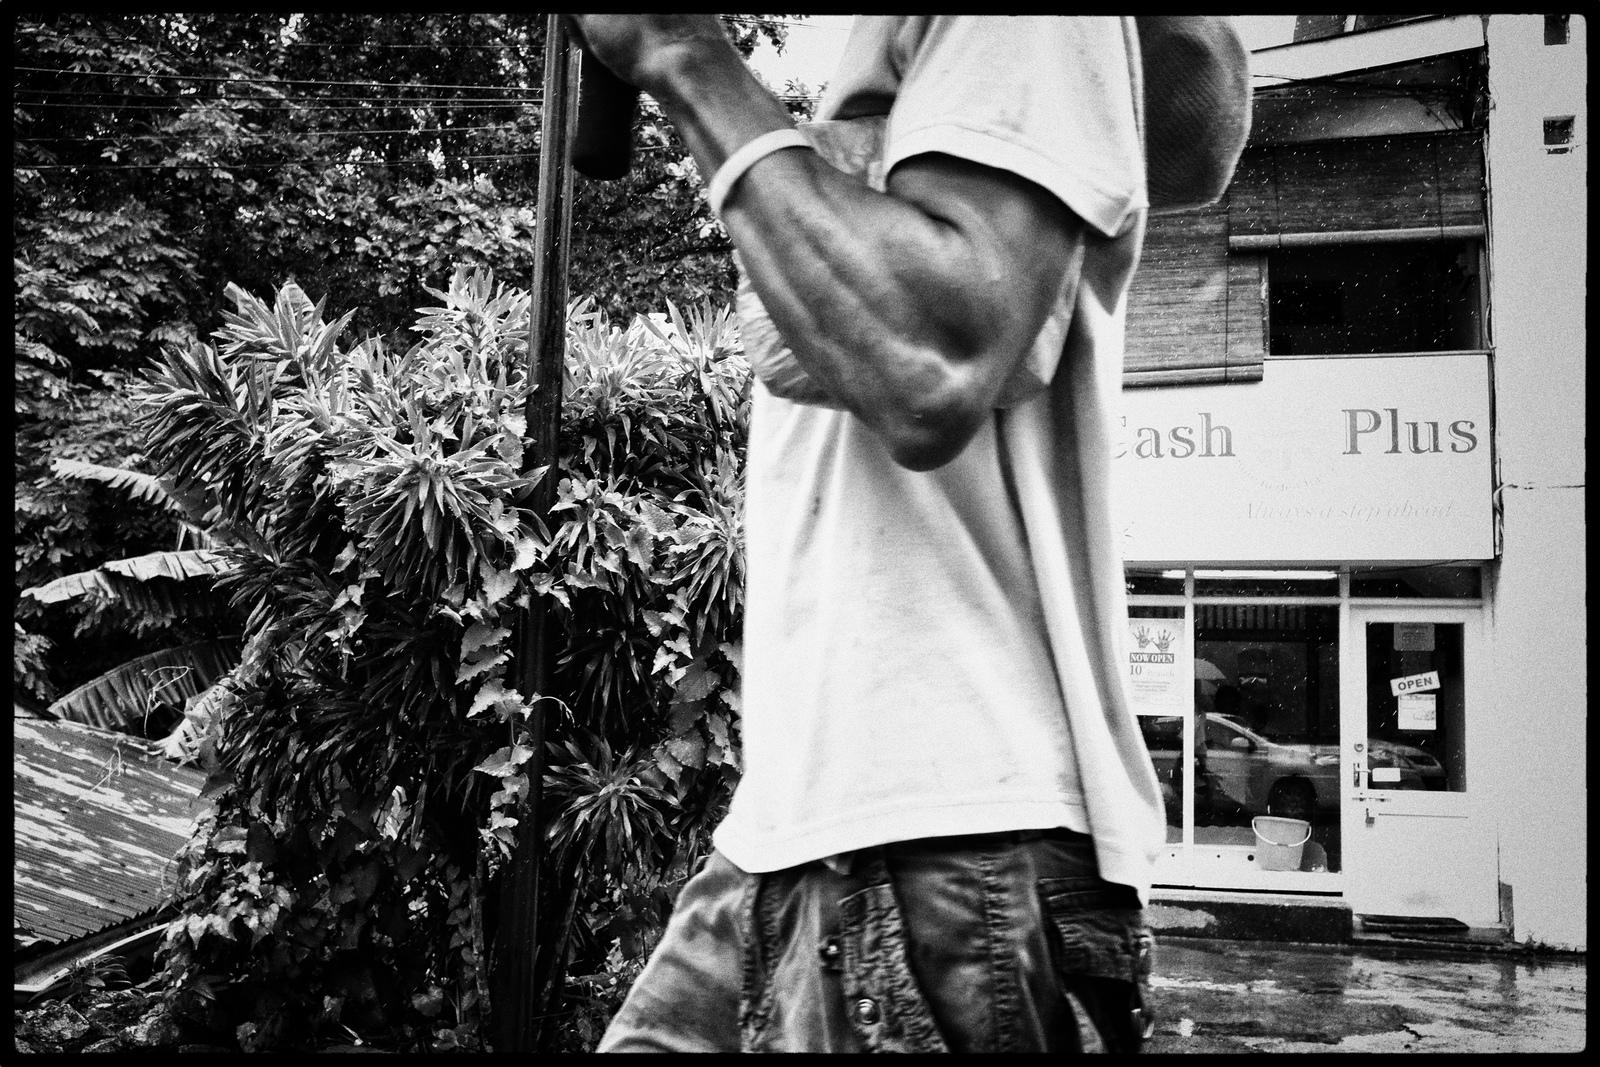 _Cyril-Fakiri-OnTheSide2017Seychelles153